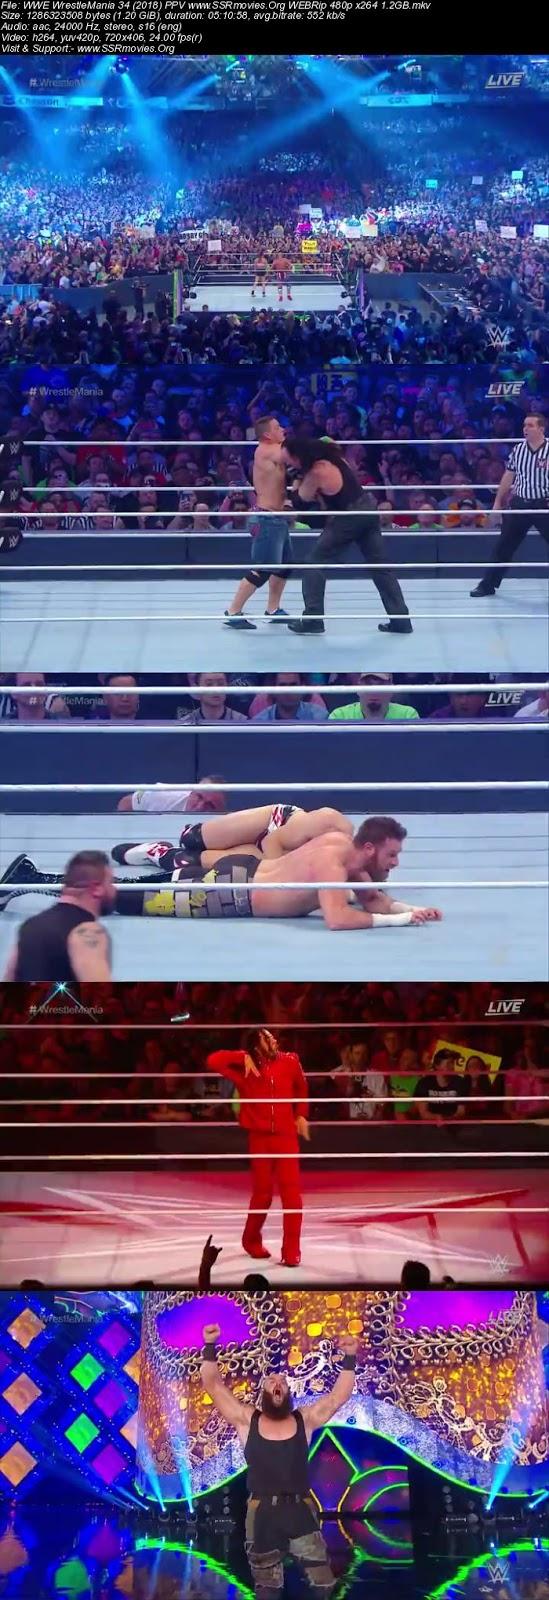 WWE WrestleMania 34 (2018) PPV WEBRip 480p Full Show Download